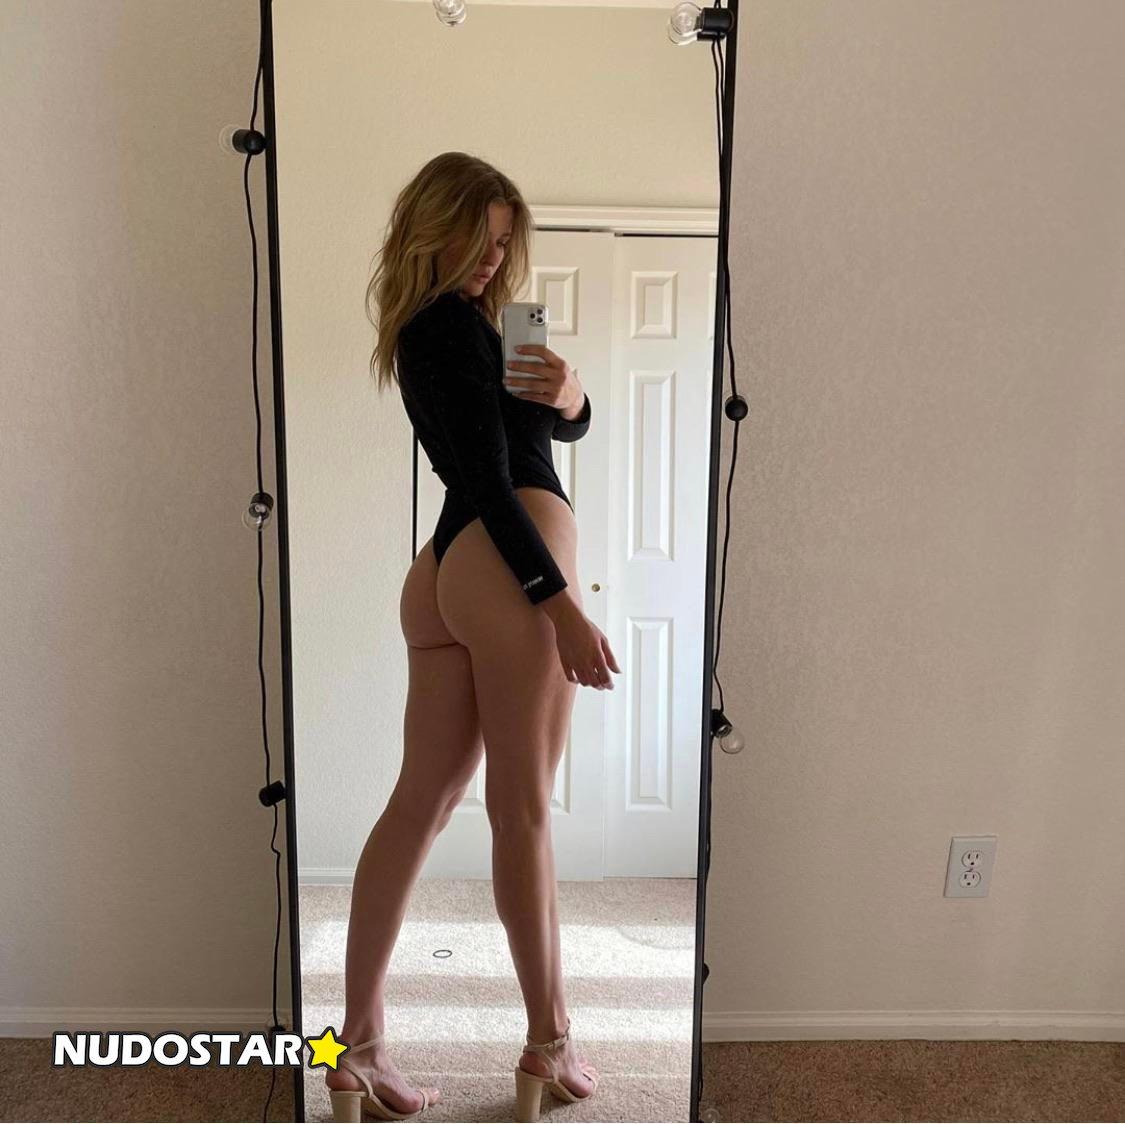 Mia Melano Miamelano777 Onlyfans Nude Leaks 0027